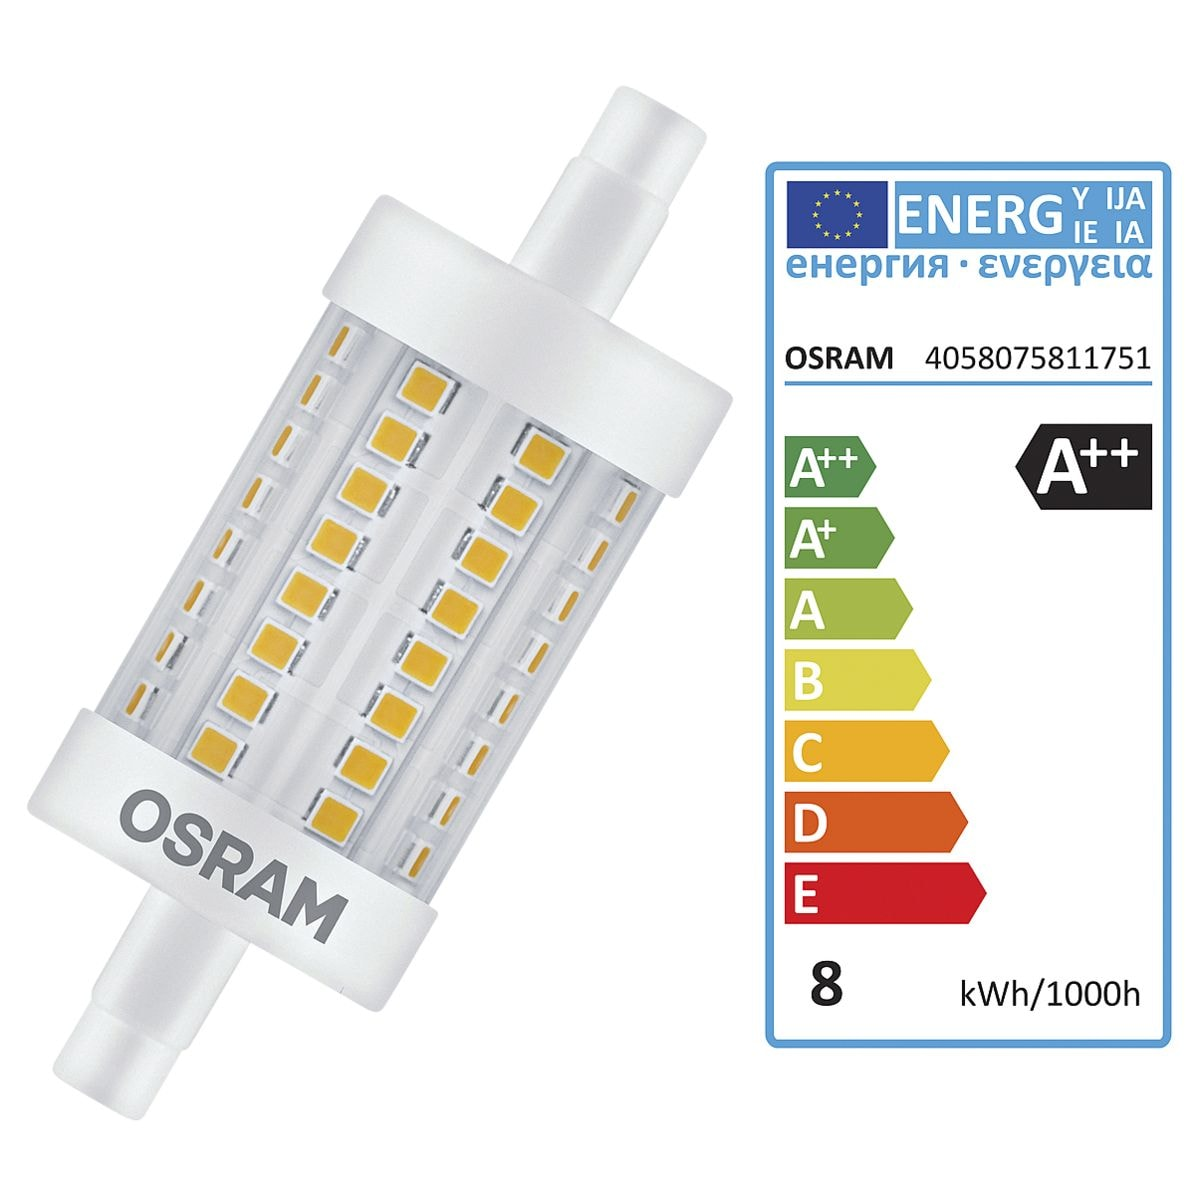 Osram LED- Speziallampe »Superstar Line R7s DIM«